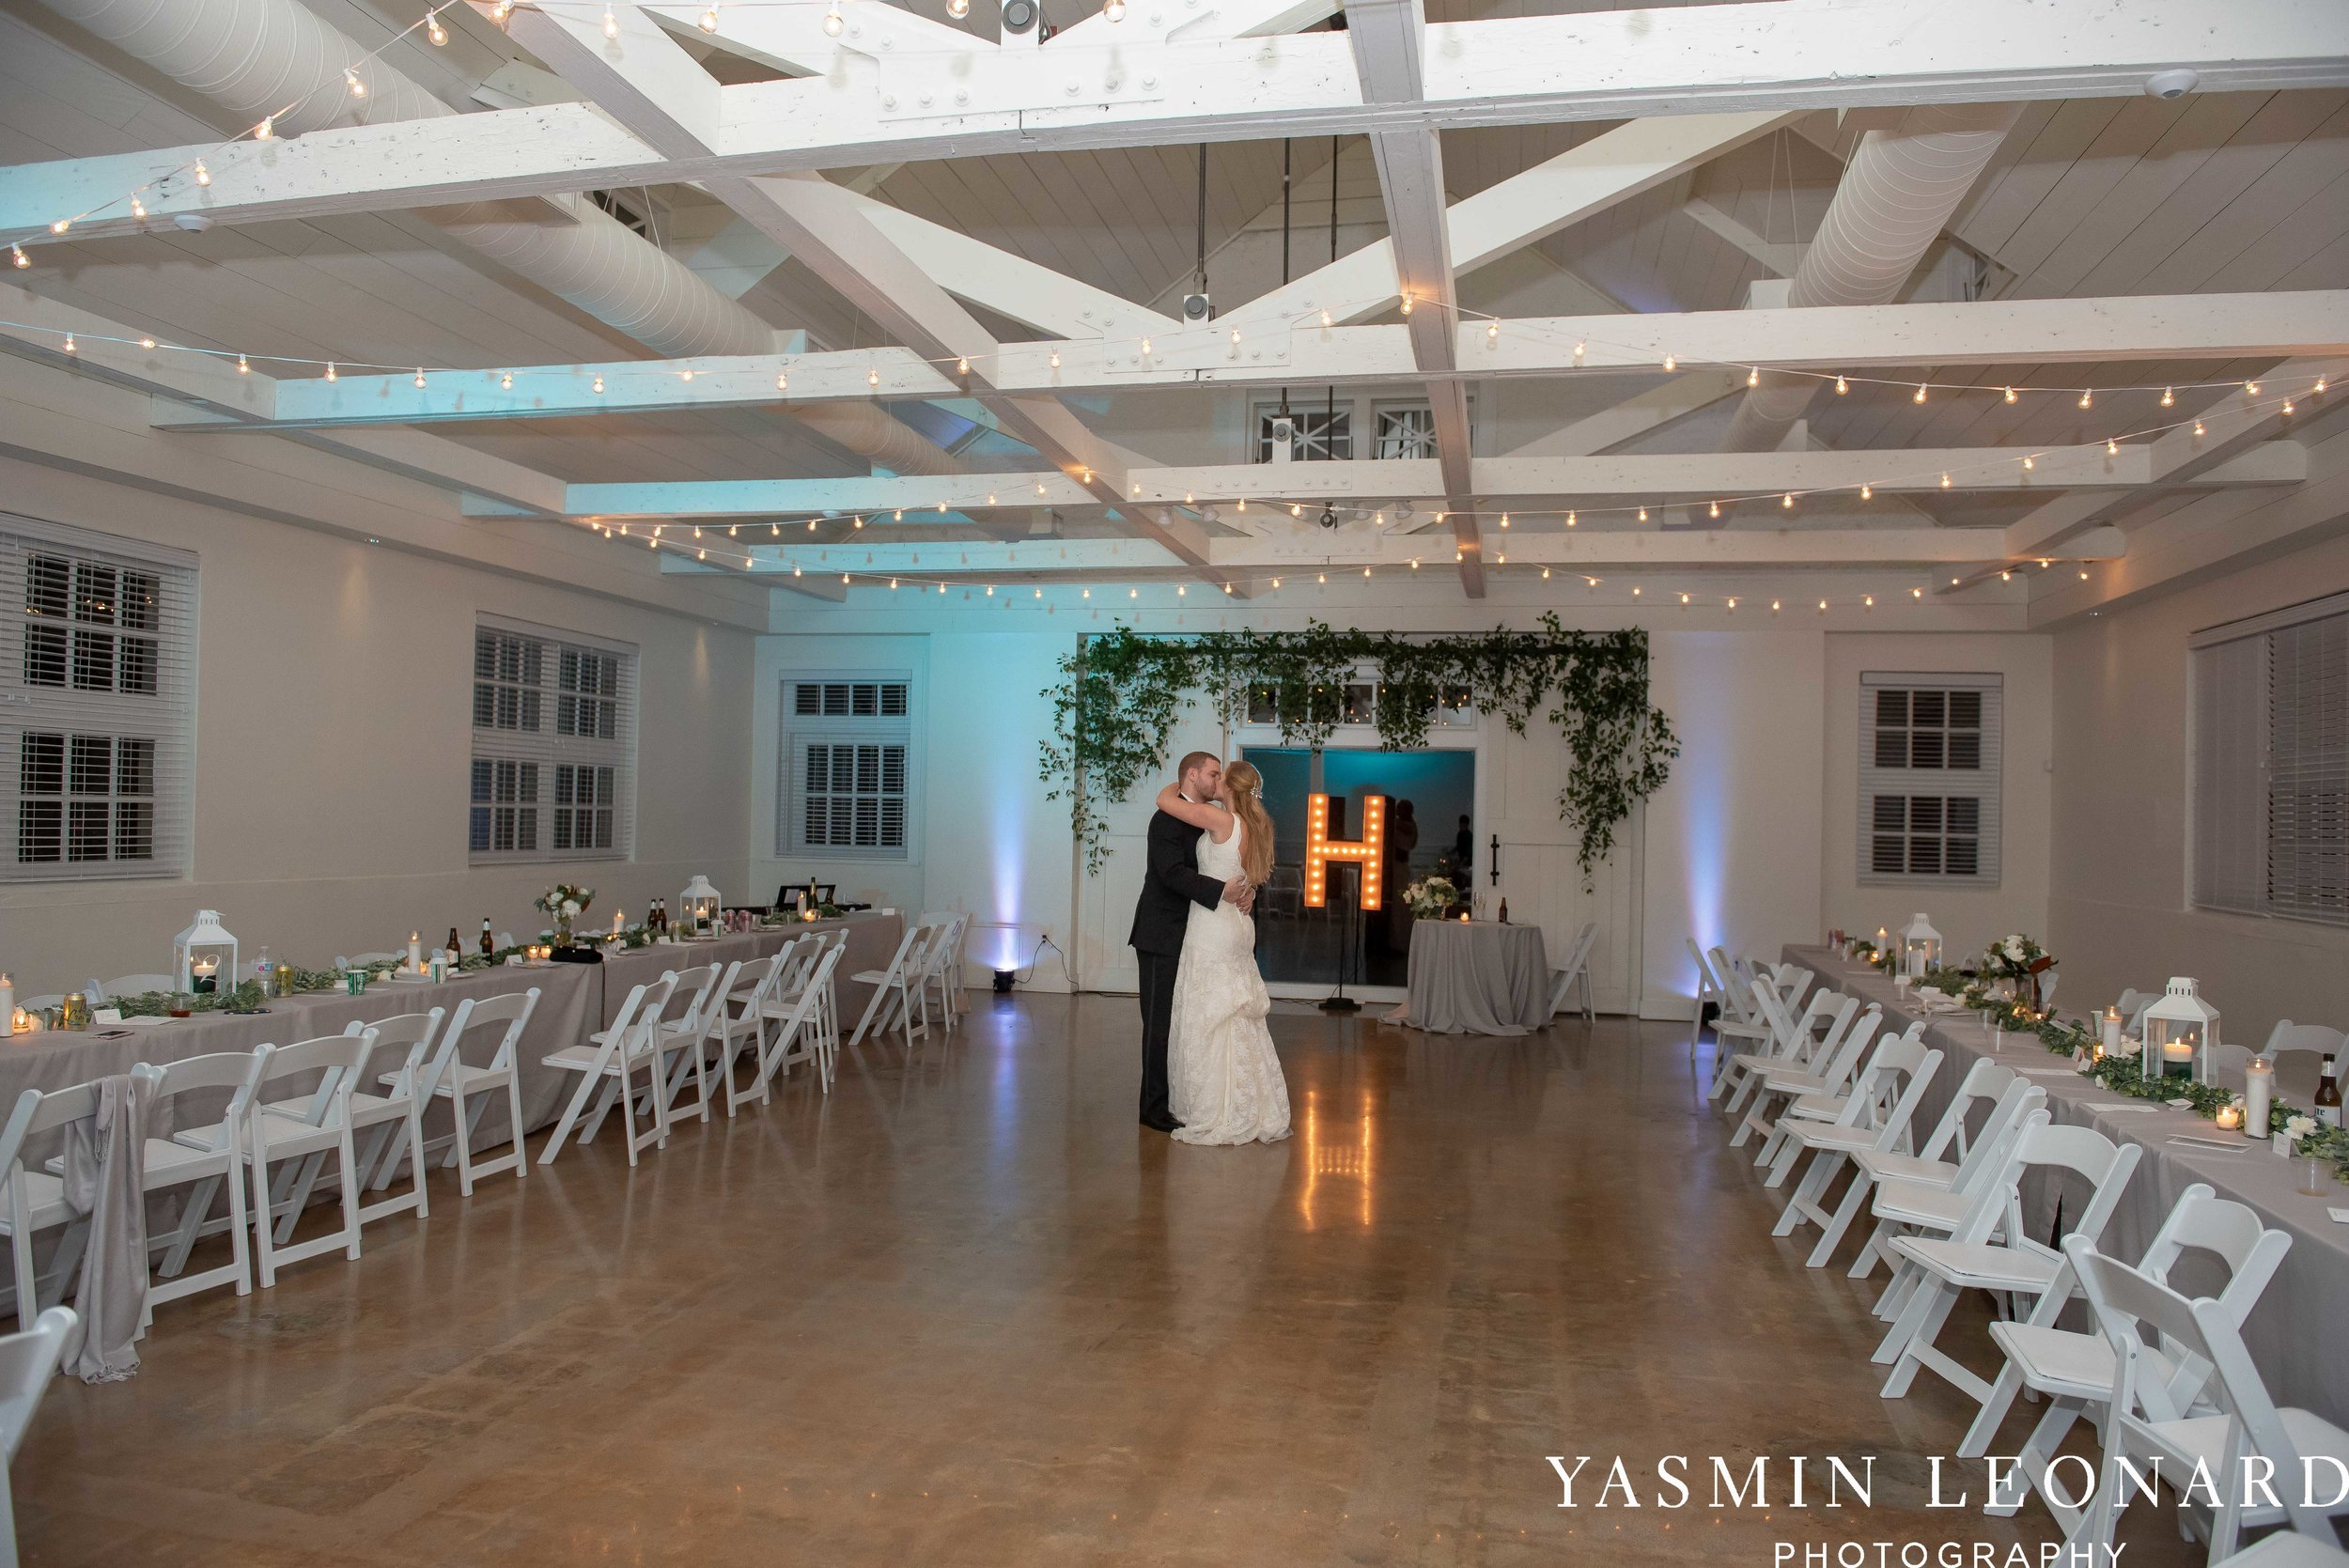 Barn at Reynolda Village - Winston Salem Wedding - White and Green Wedding - NC Wedding - NC Barns - Yasmin Leonard Photography-105.jpg